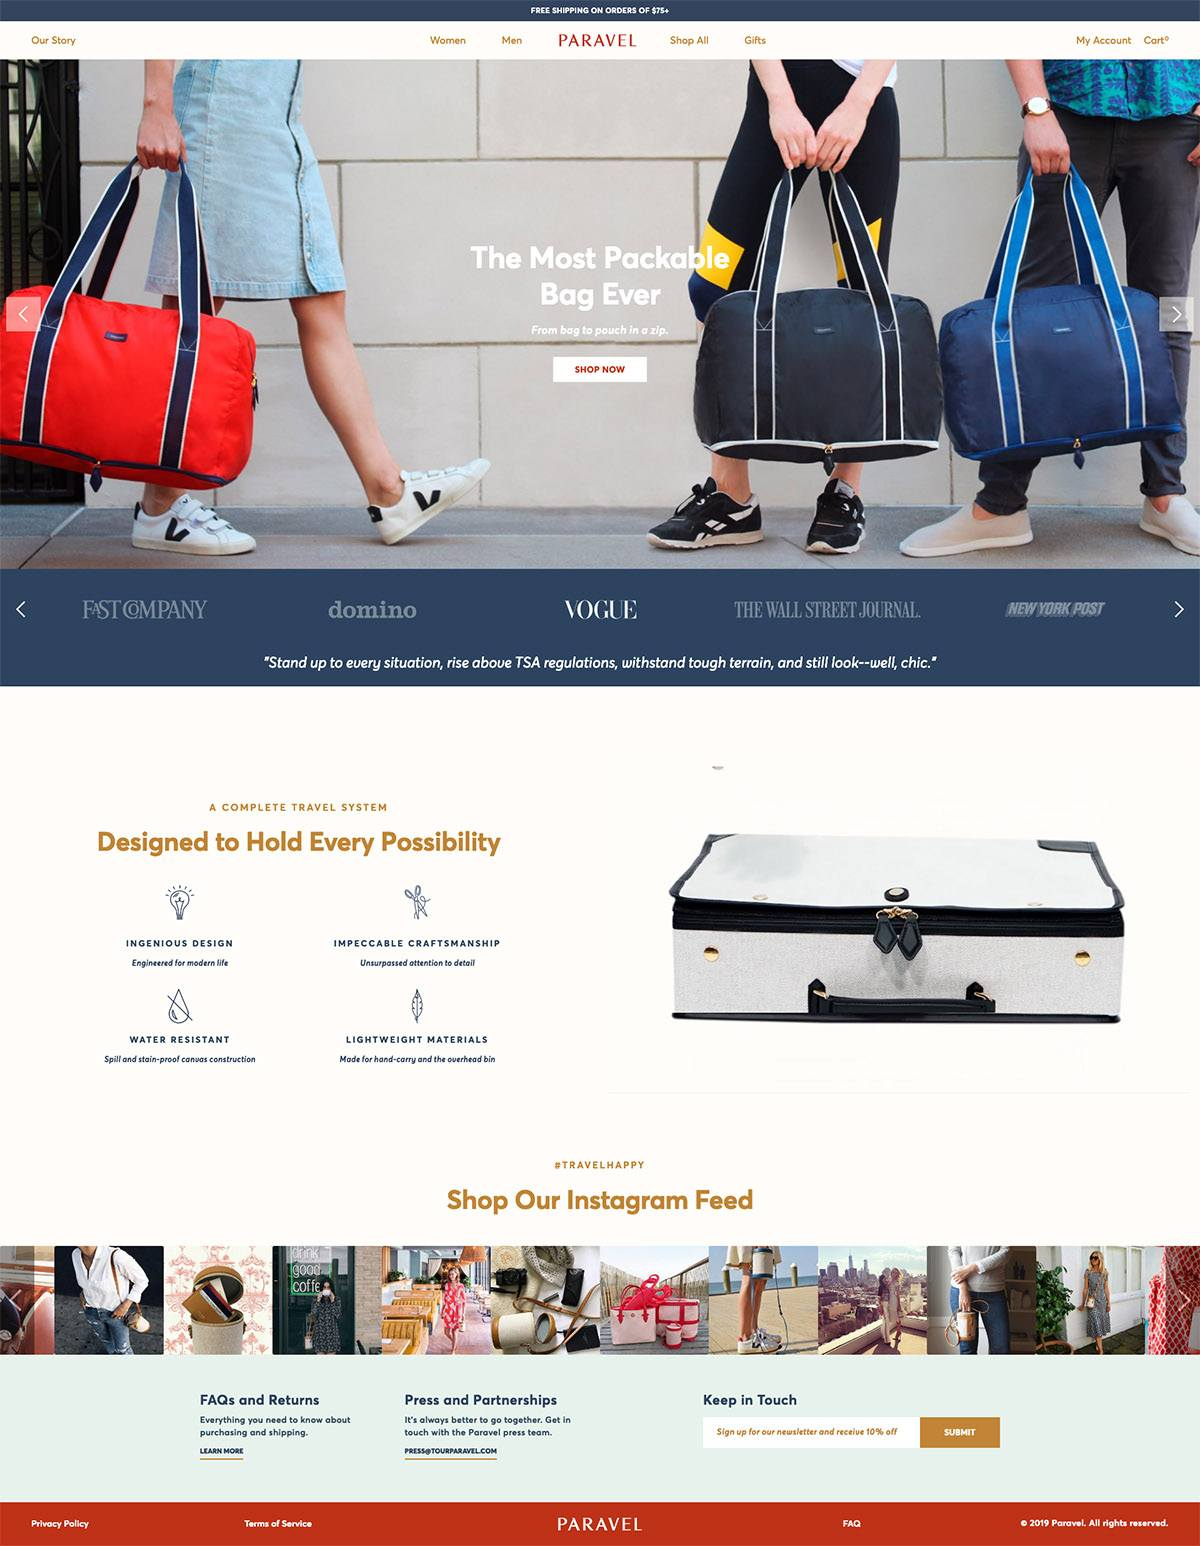 eCommerce website: Paravel